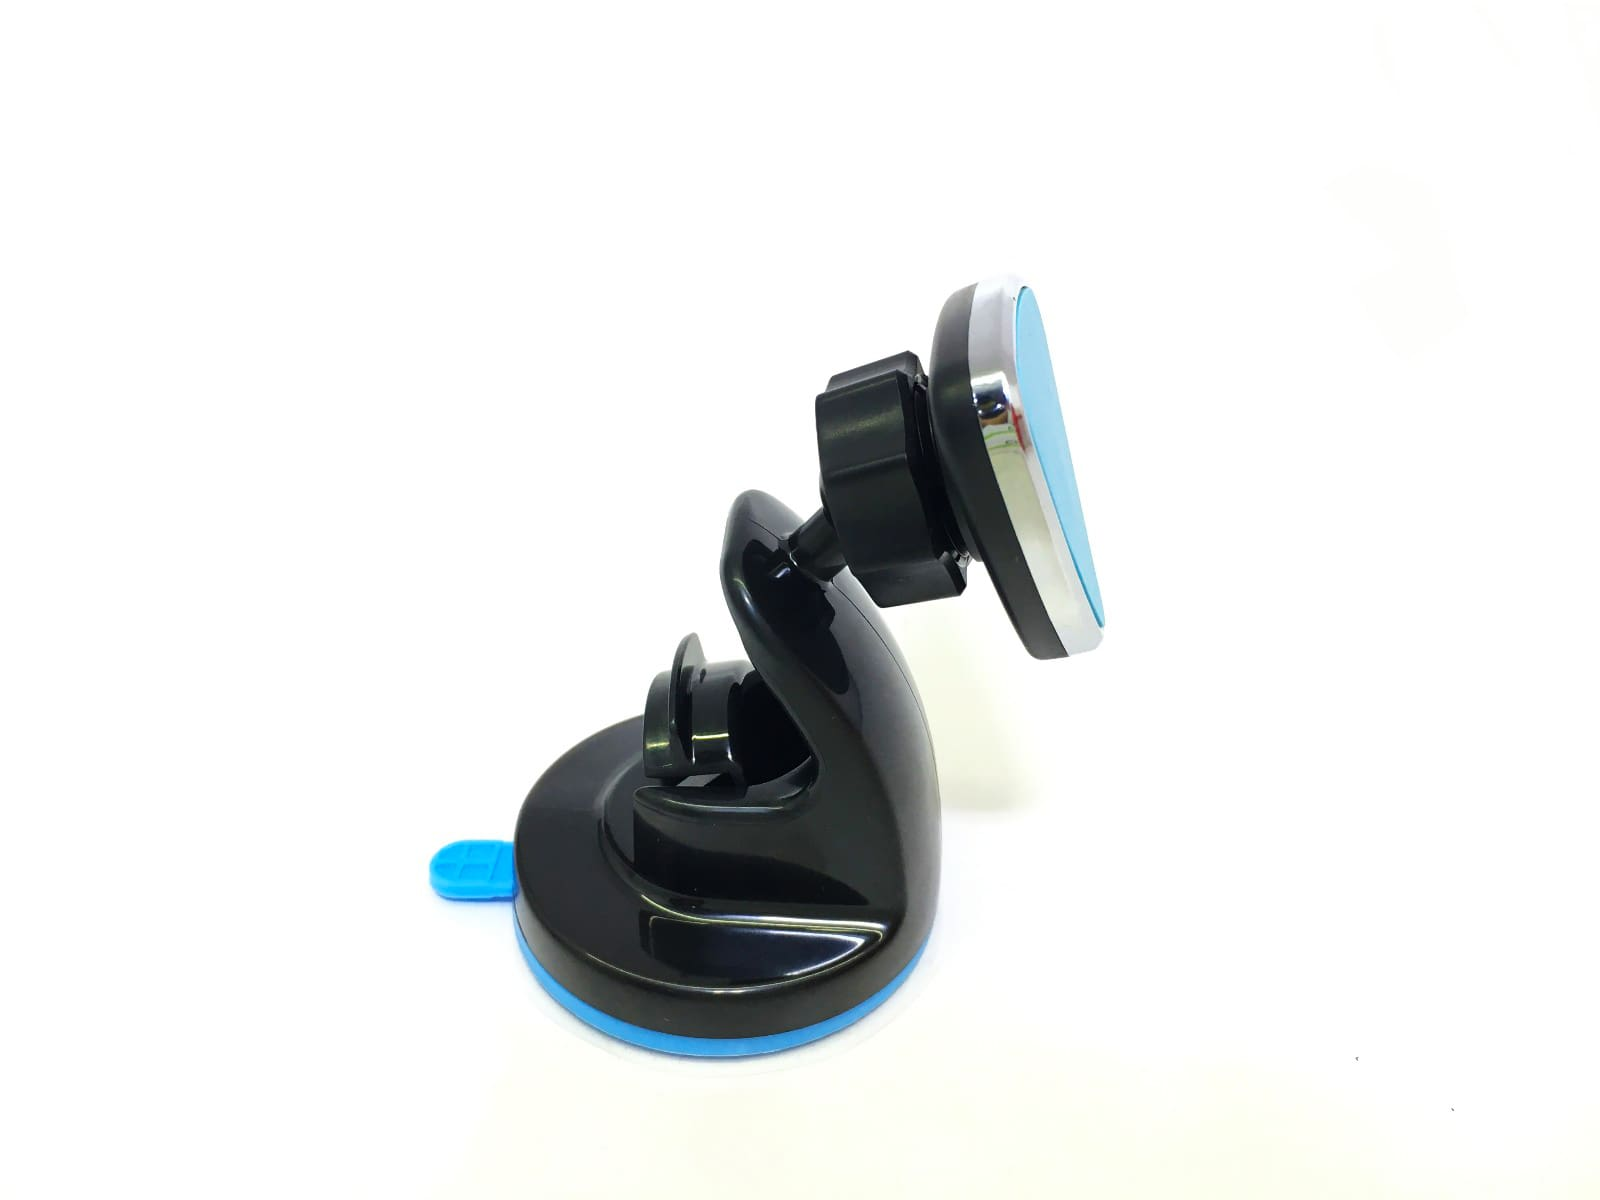 telefon tutucu araçi süper telefon tutan mıknatıslı dır. fsmauto